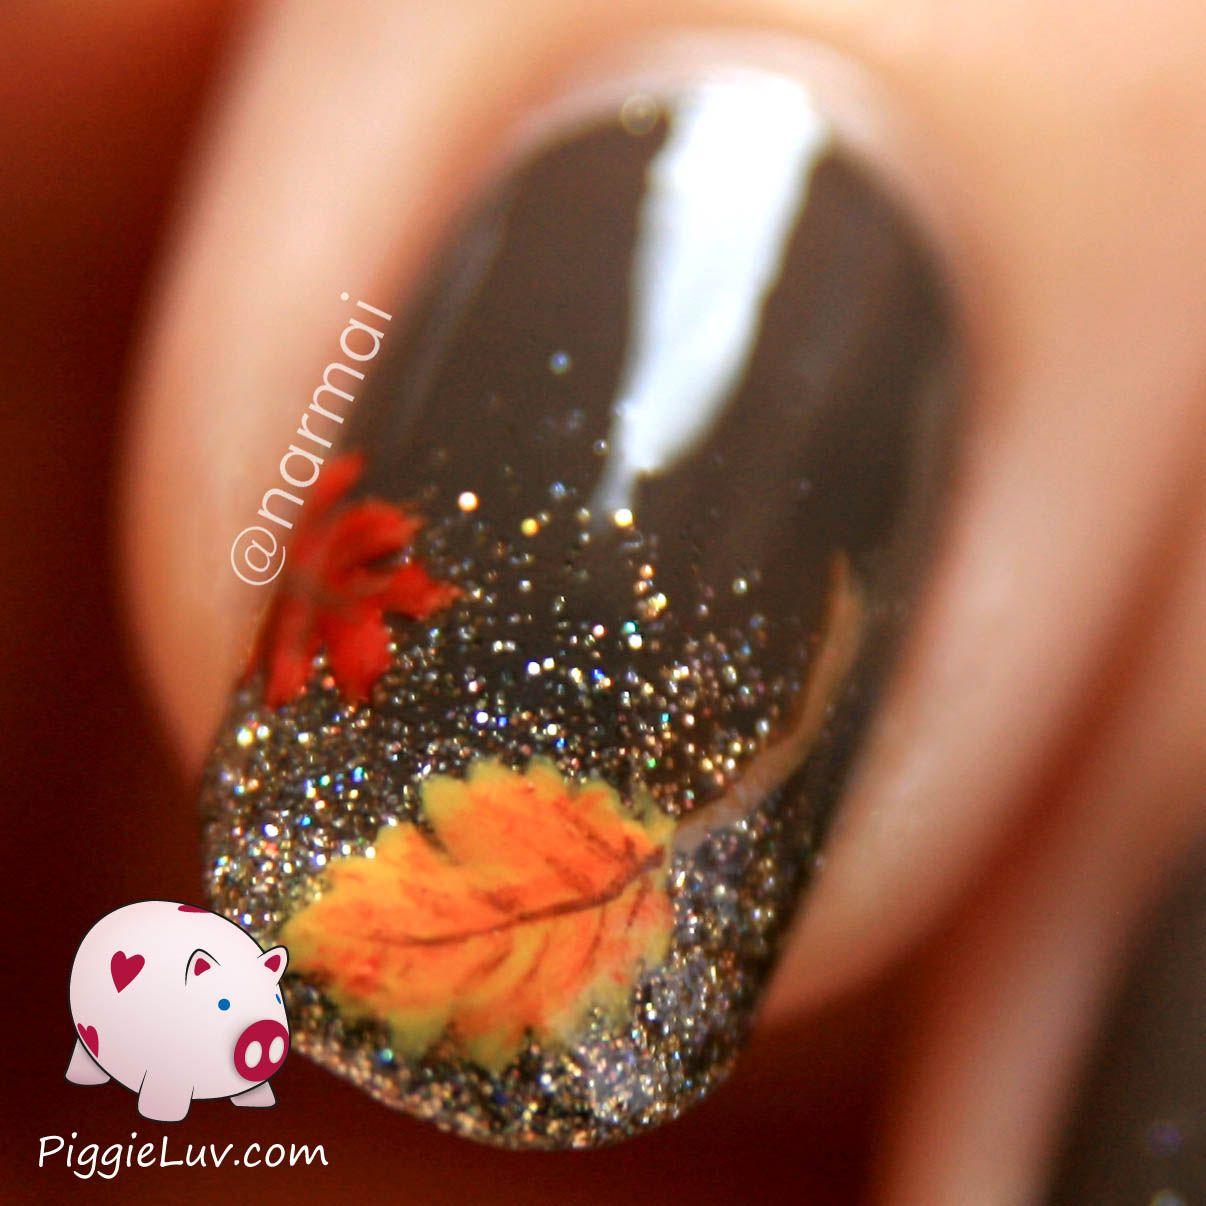 Piggieluv Fall Nail Art Autumn Leaves On Glitter Grant